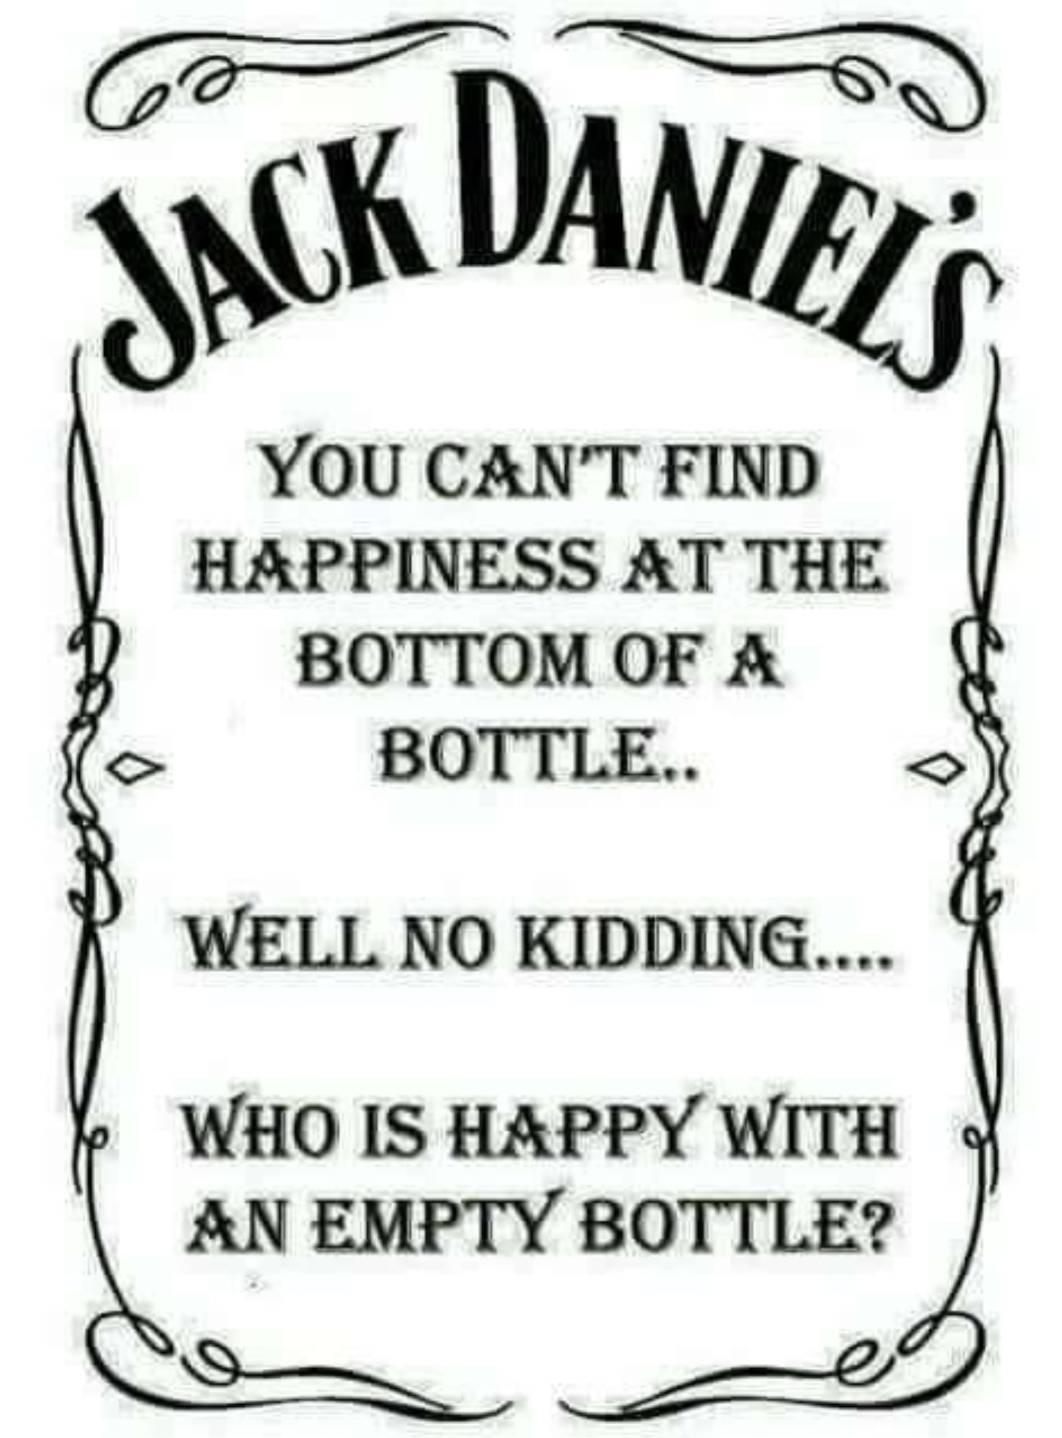 jack danials.jpg